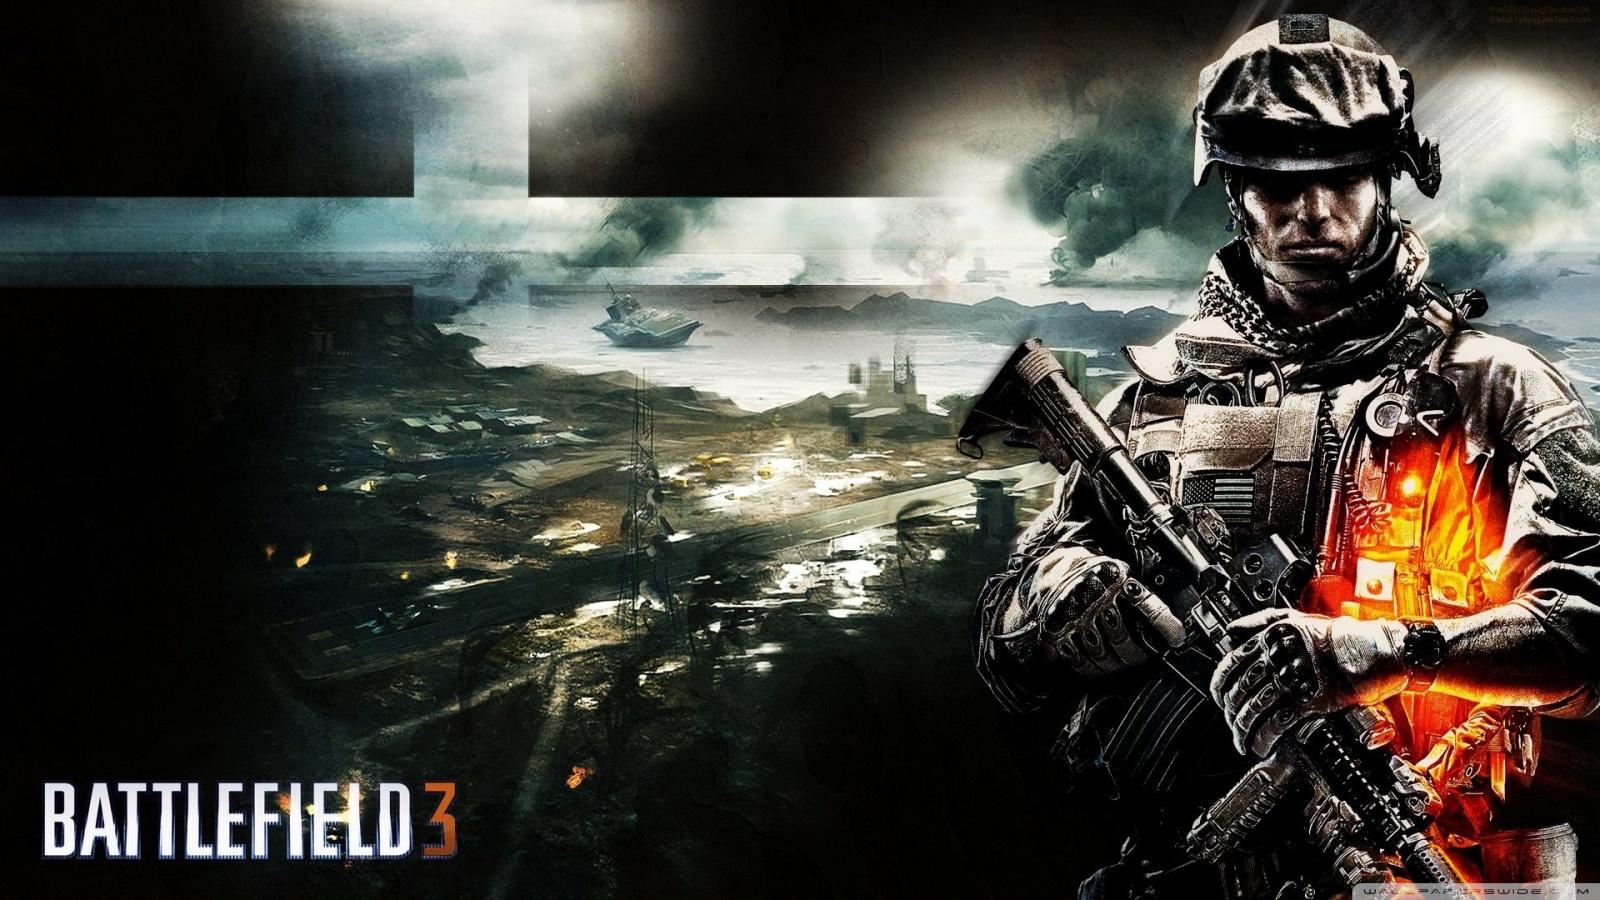 http://1.bp.blogspot.com/-UCU_7iGcM_4/UDelsNz0x_I/AAAAAAAAAXo/m8yuUgAGpu0/s1600/battlefield_3_b2k-wallpaper-1600x900.jpg